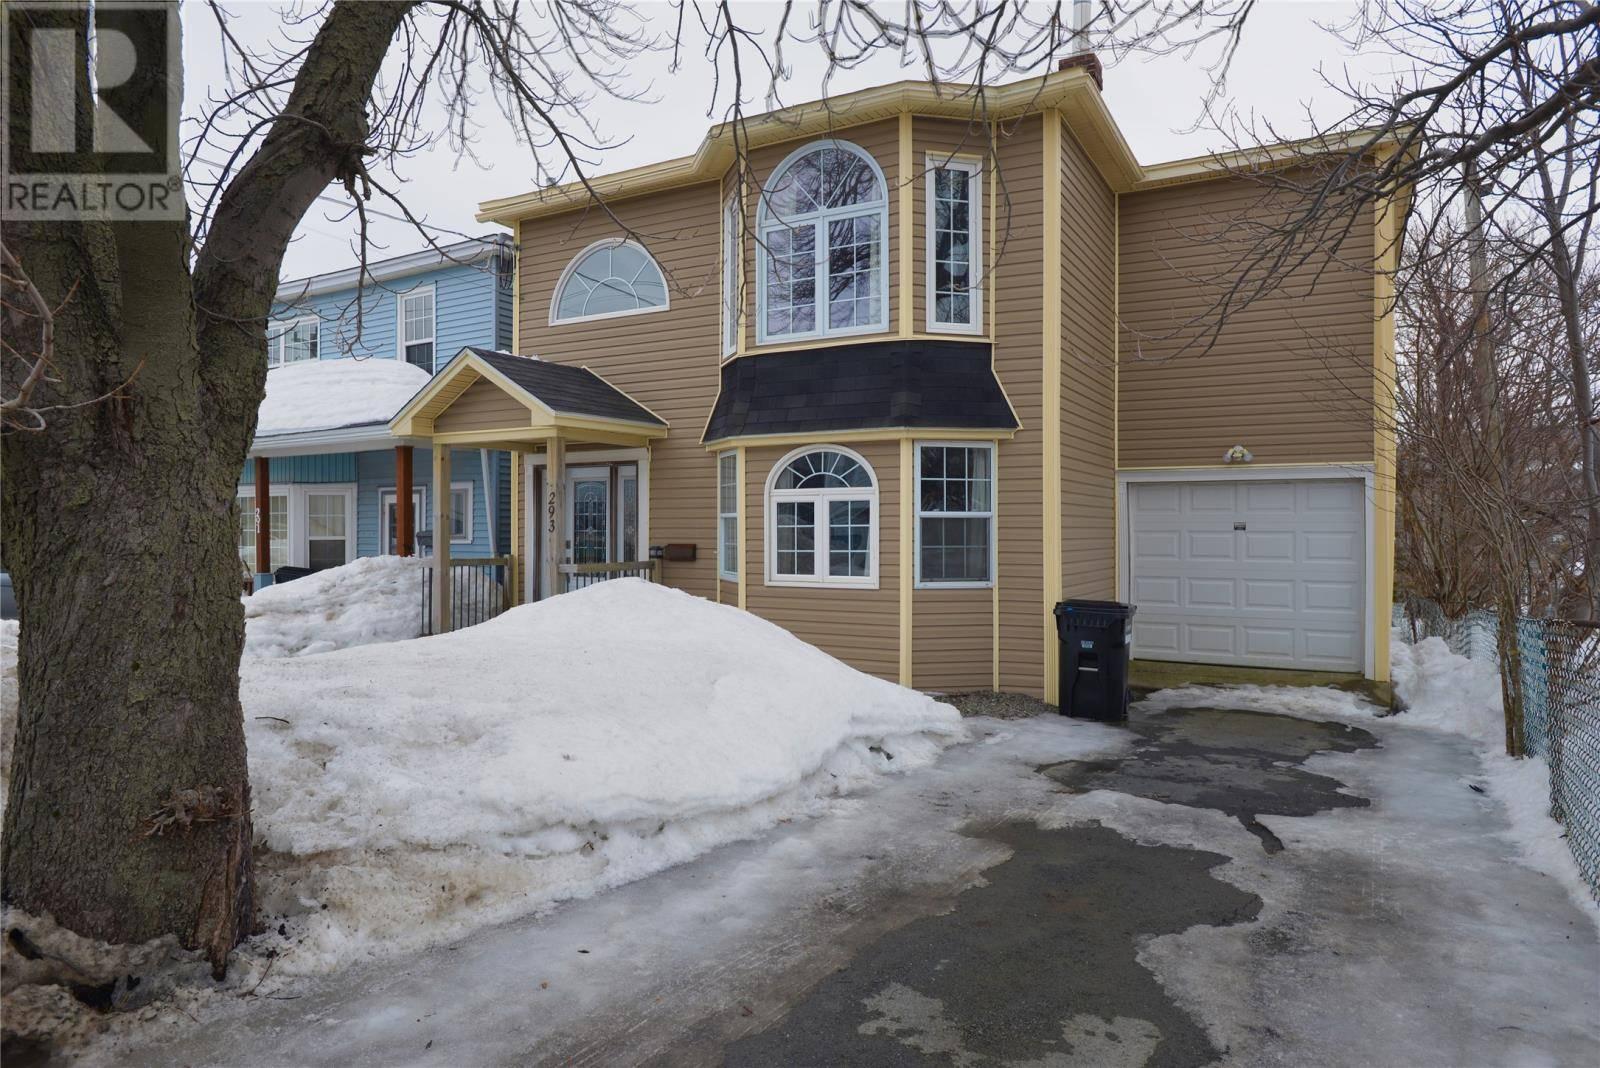 House for sale at 293 Hamilton Ave St. John's Newfoundland - MLS: 1212021